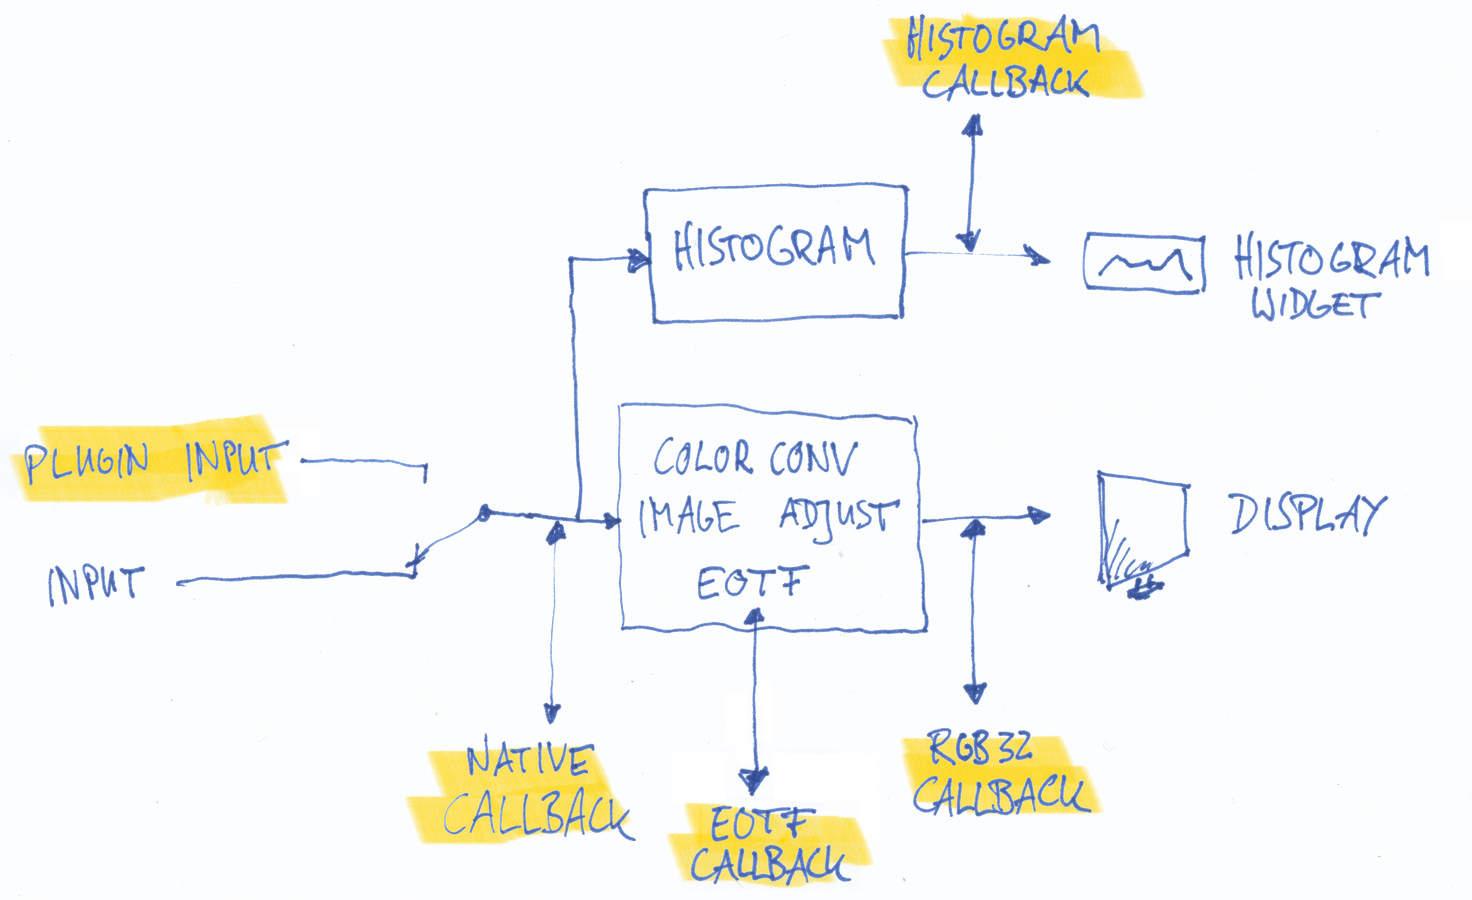 vooya - Plugin API